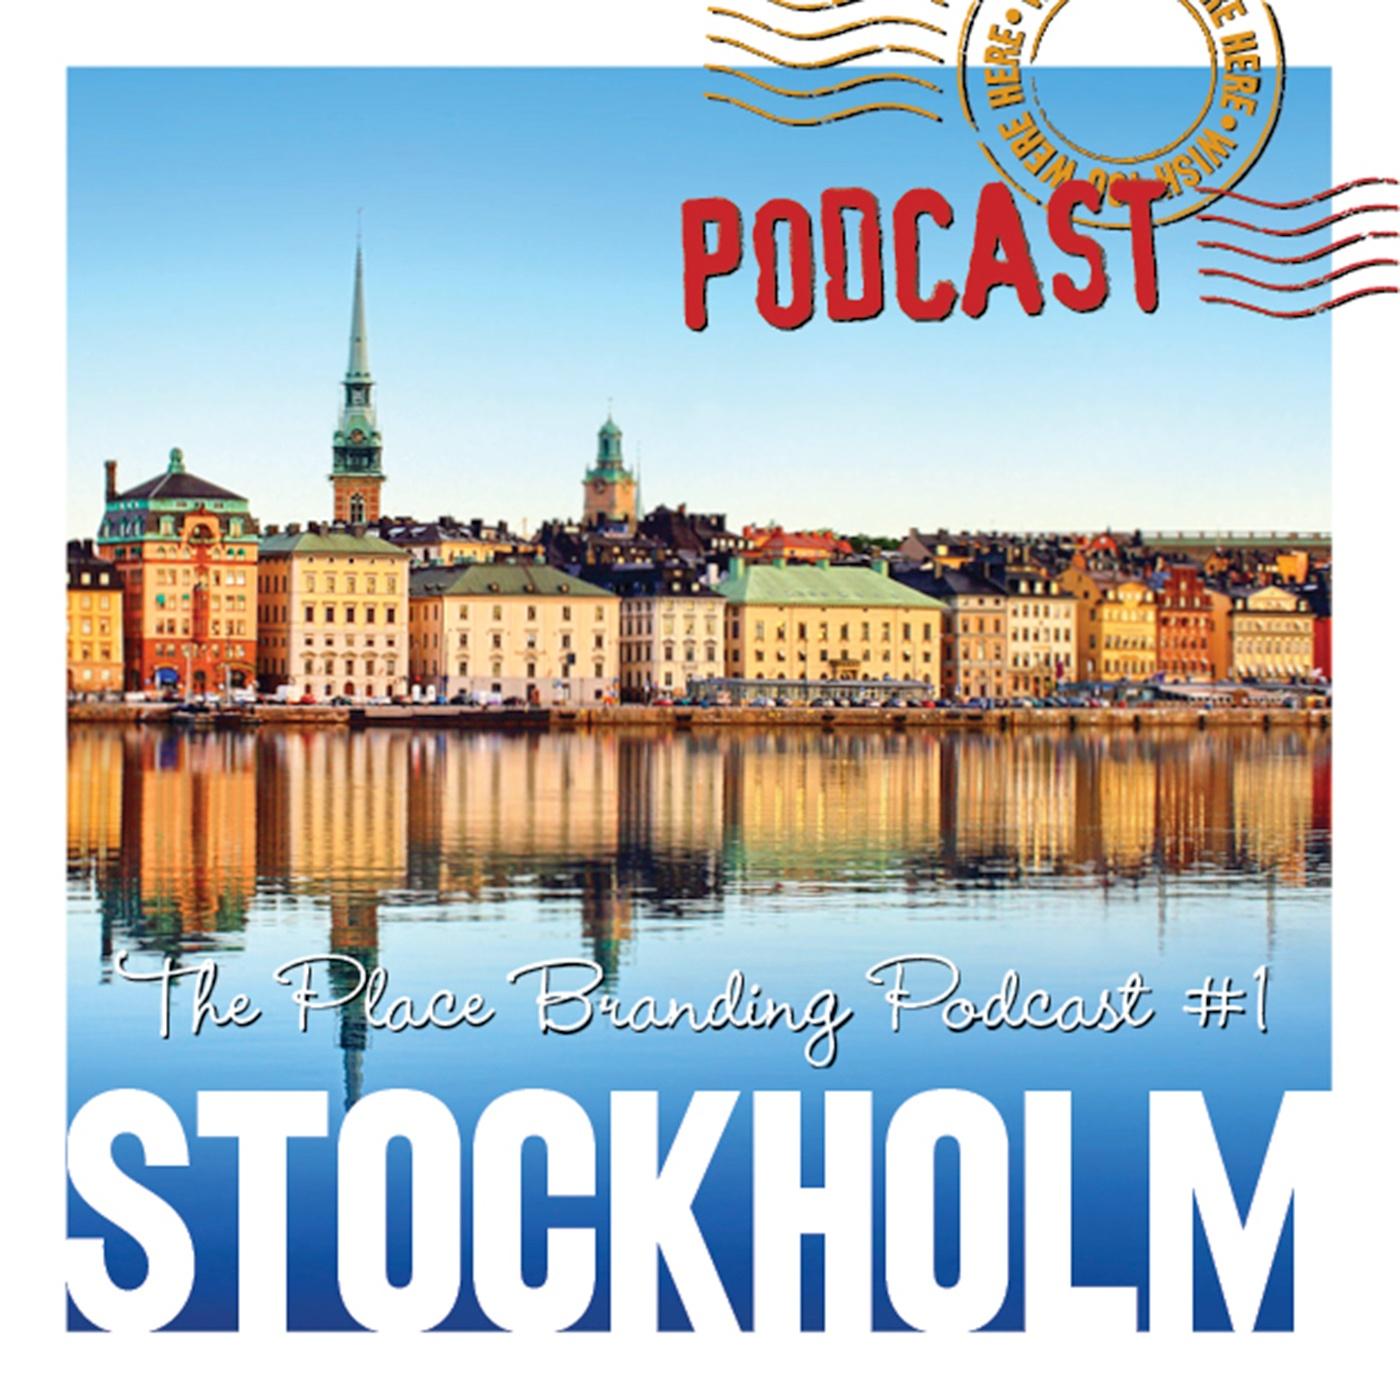 Place branding podcast: episode 1: Stockholm